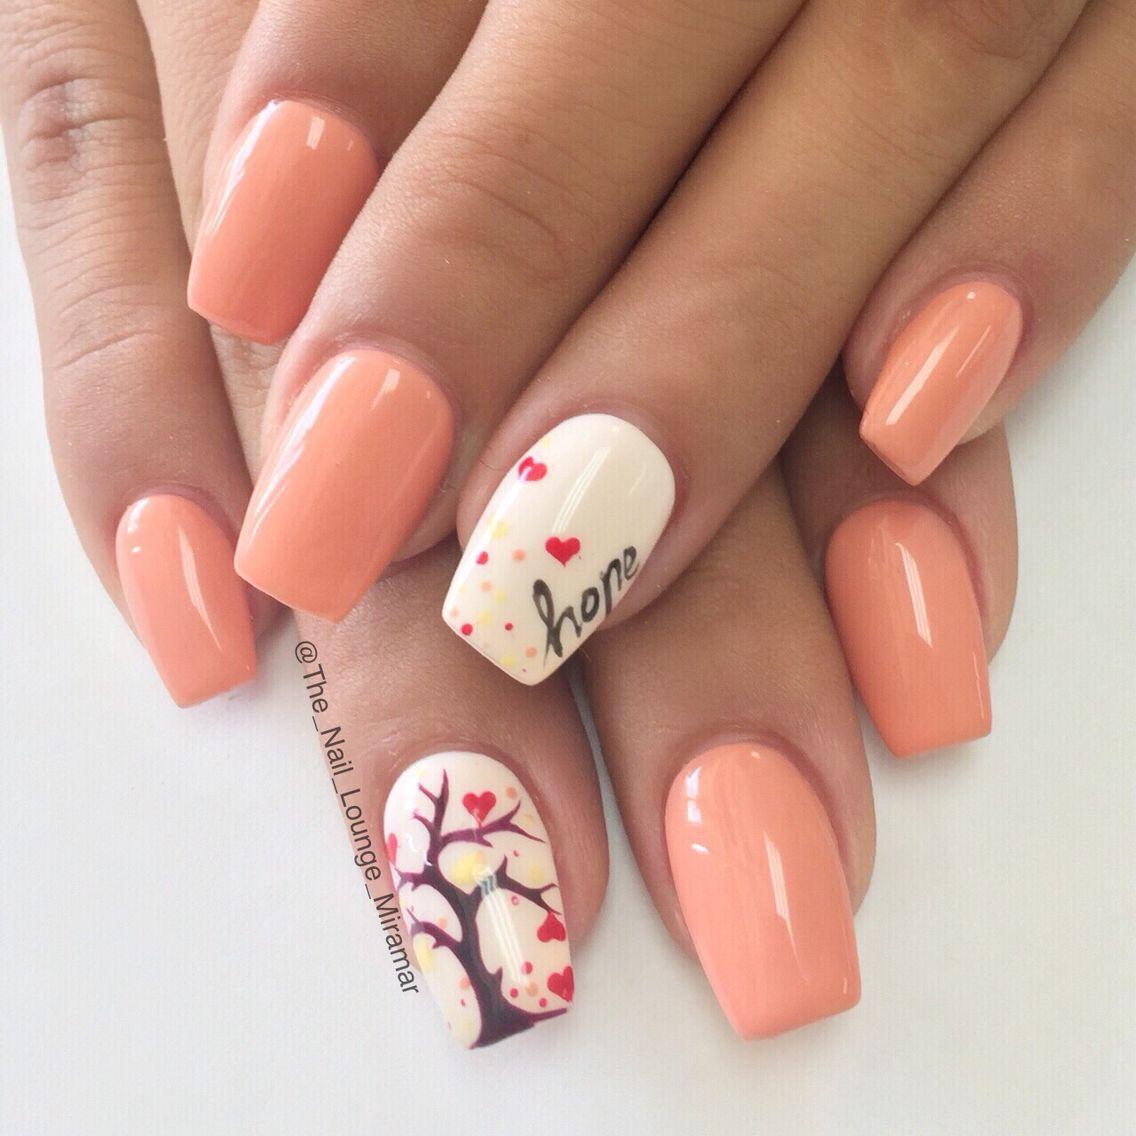 Hope fall heart tree nail art design | Nail Art ...